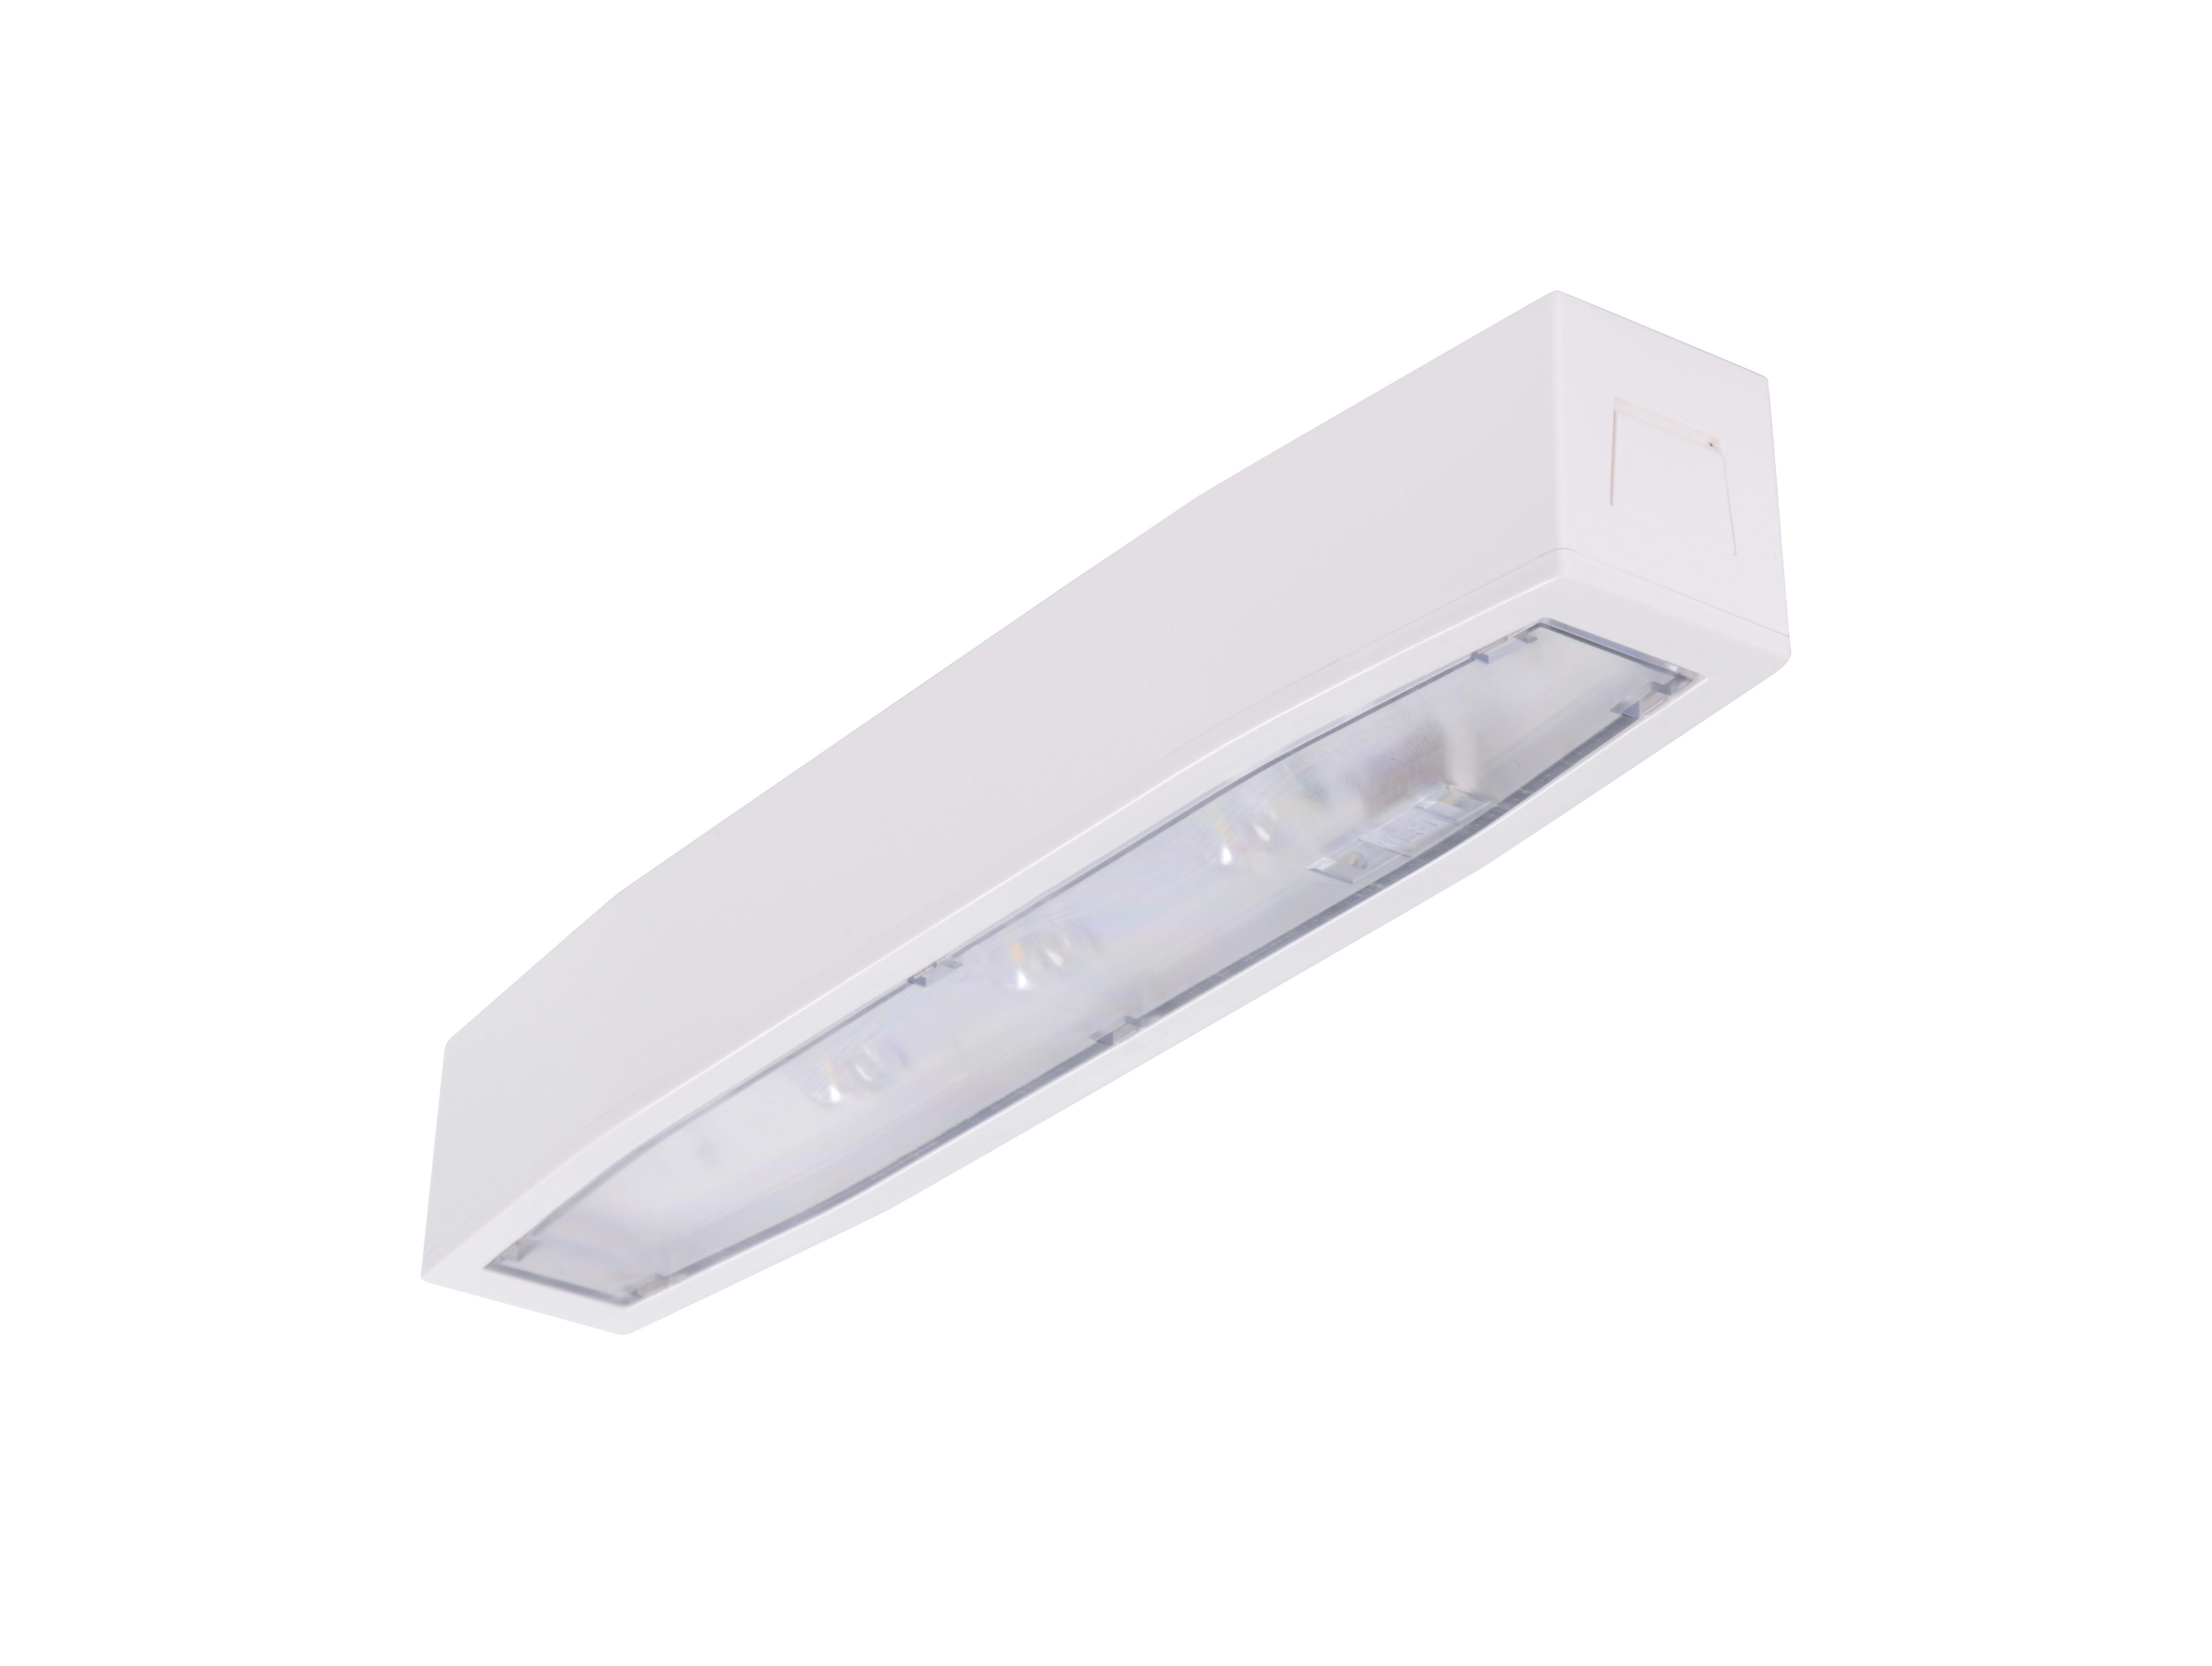 Lampa emergenta led Intelight 94554   3h mentinut test automat 0